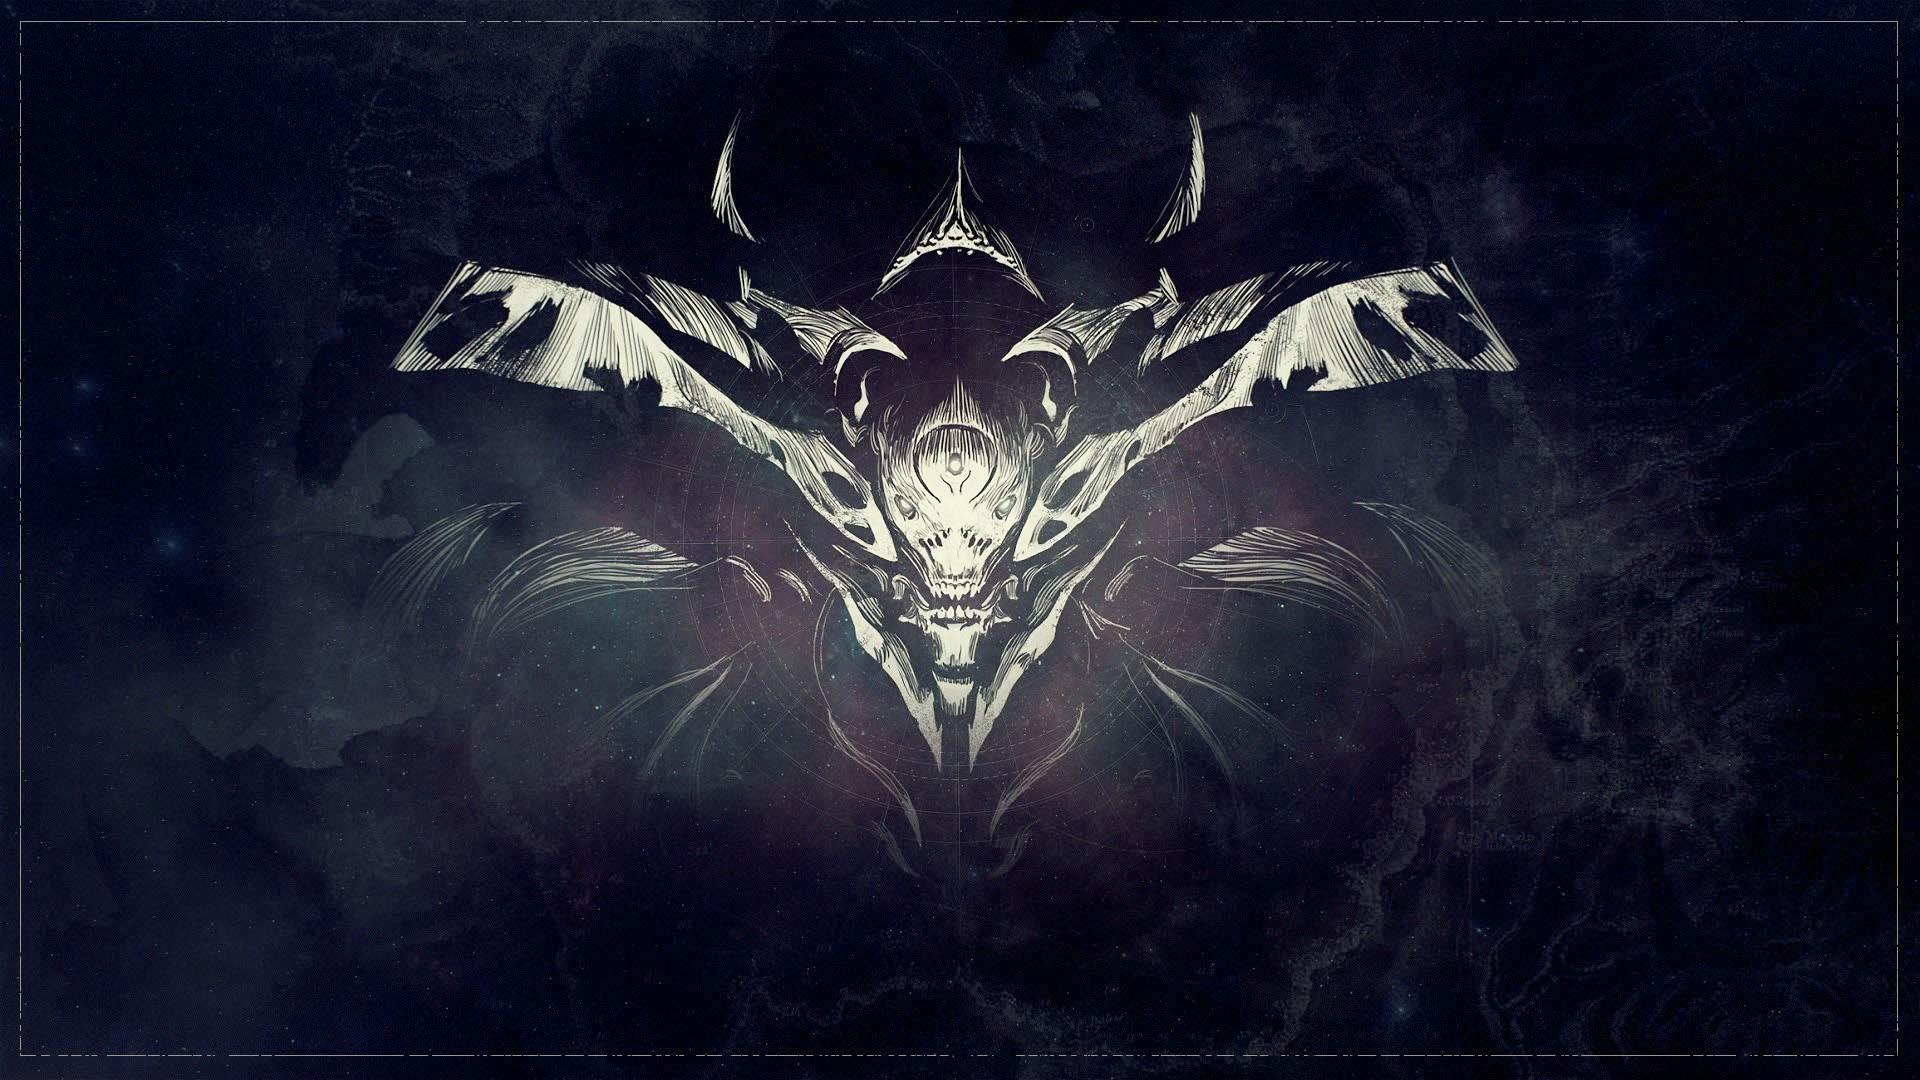 Destiny The Taken King Wallpaper: Destiny The Taken King Wallpaper